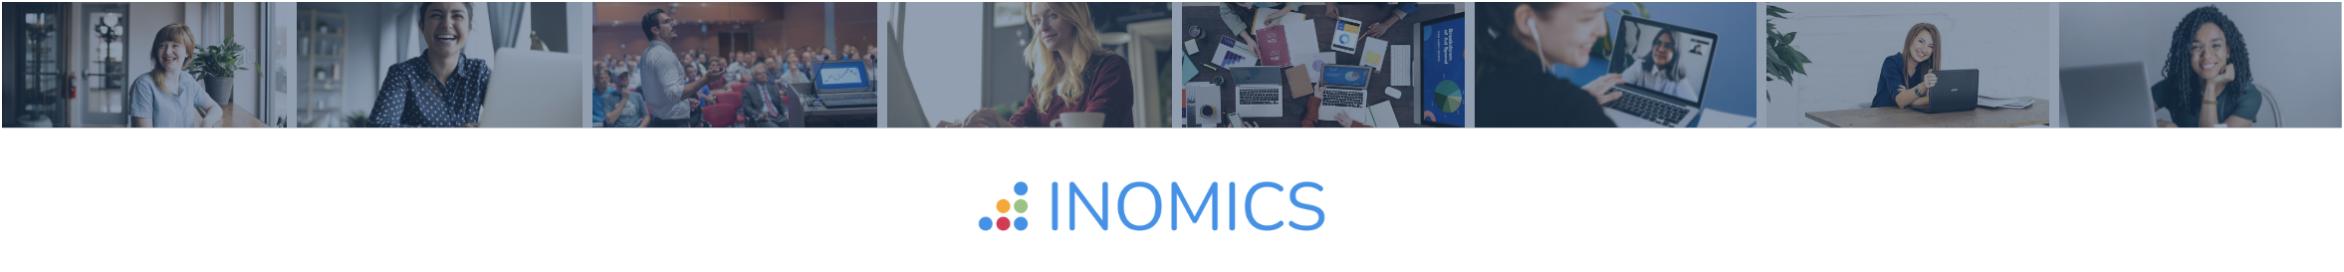 INOMICS Customer Referral Program